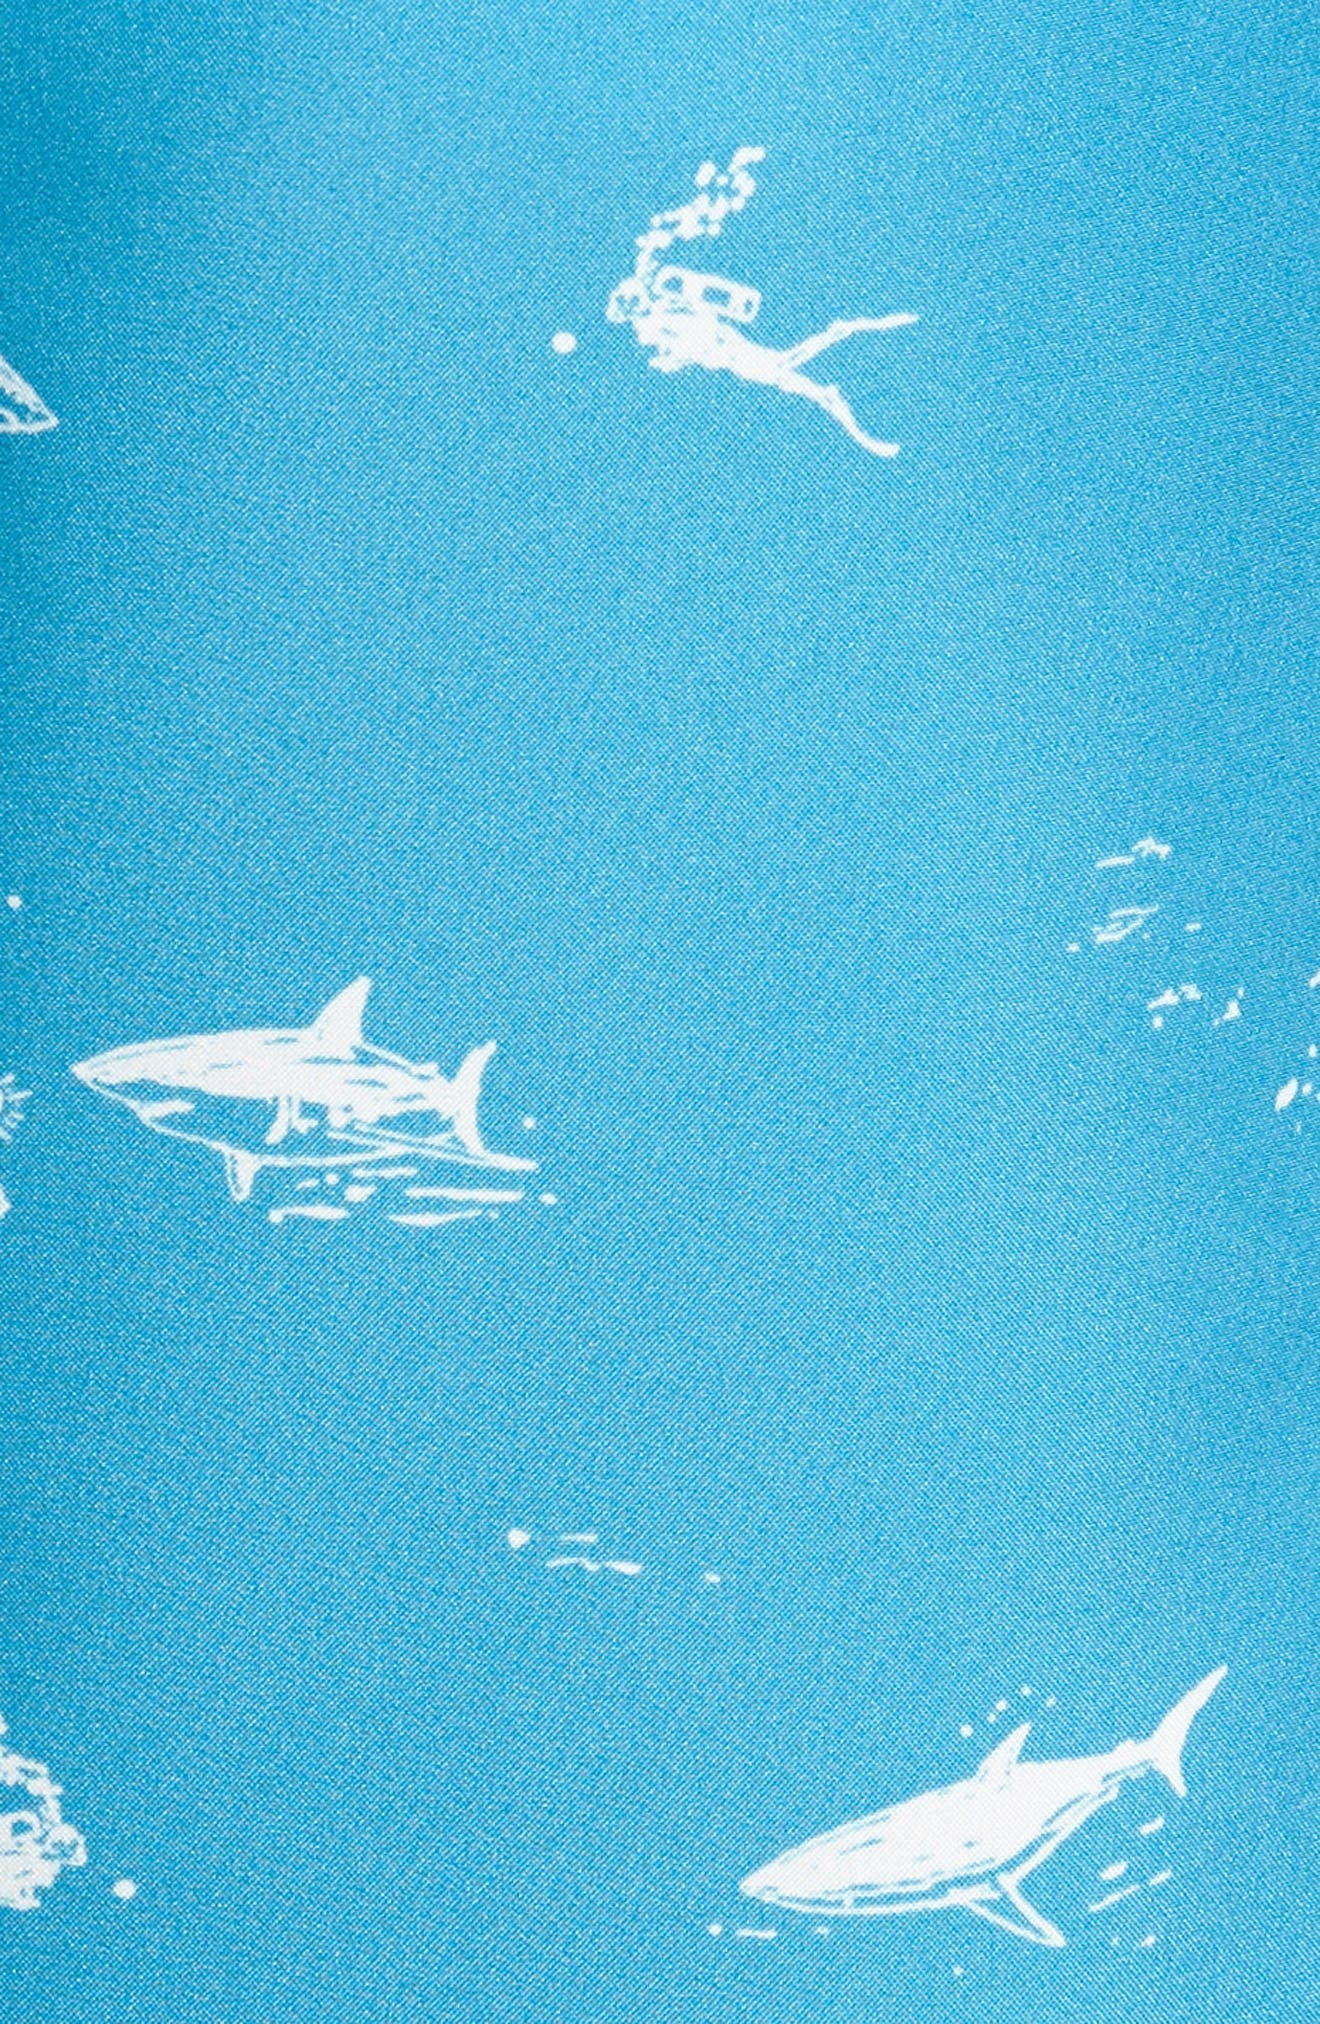 Banzai 9-Inch Swim Trunks,                             Alternate thumbnail 5, color,                             Scuba Dive Print